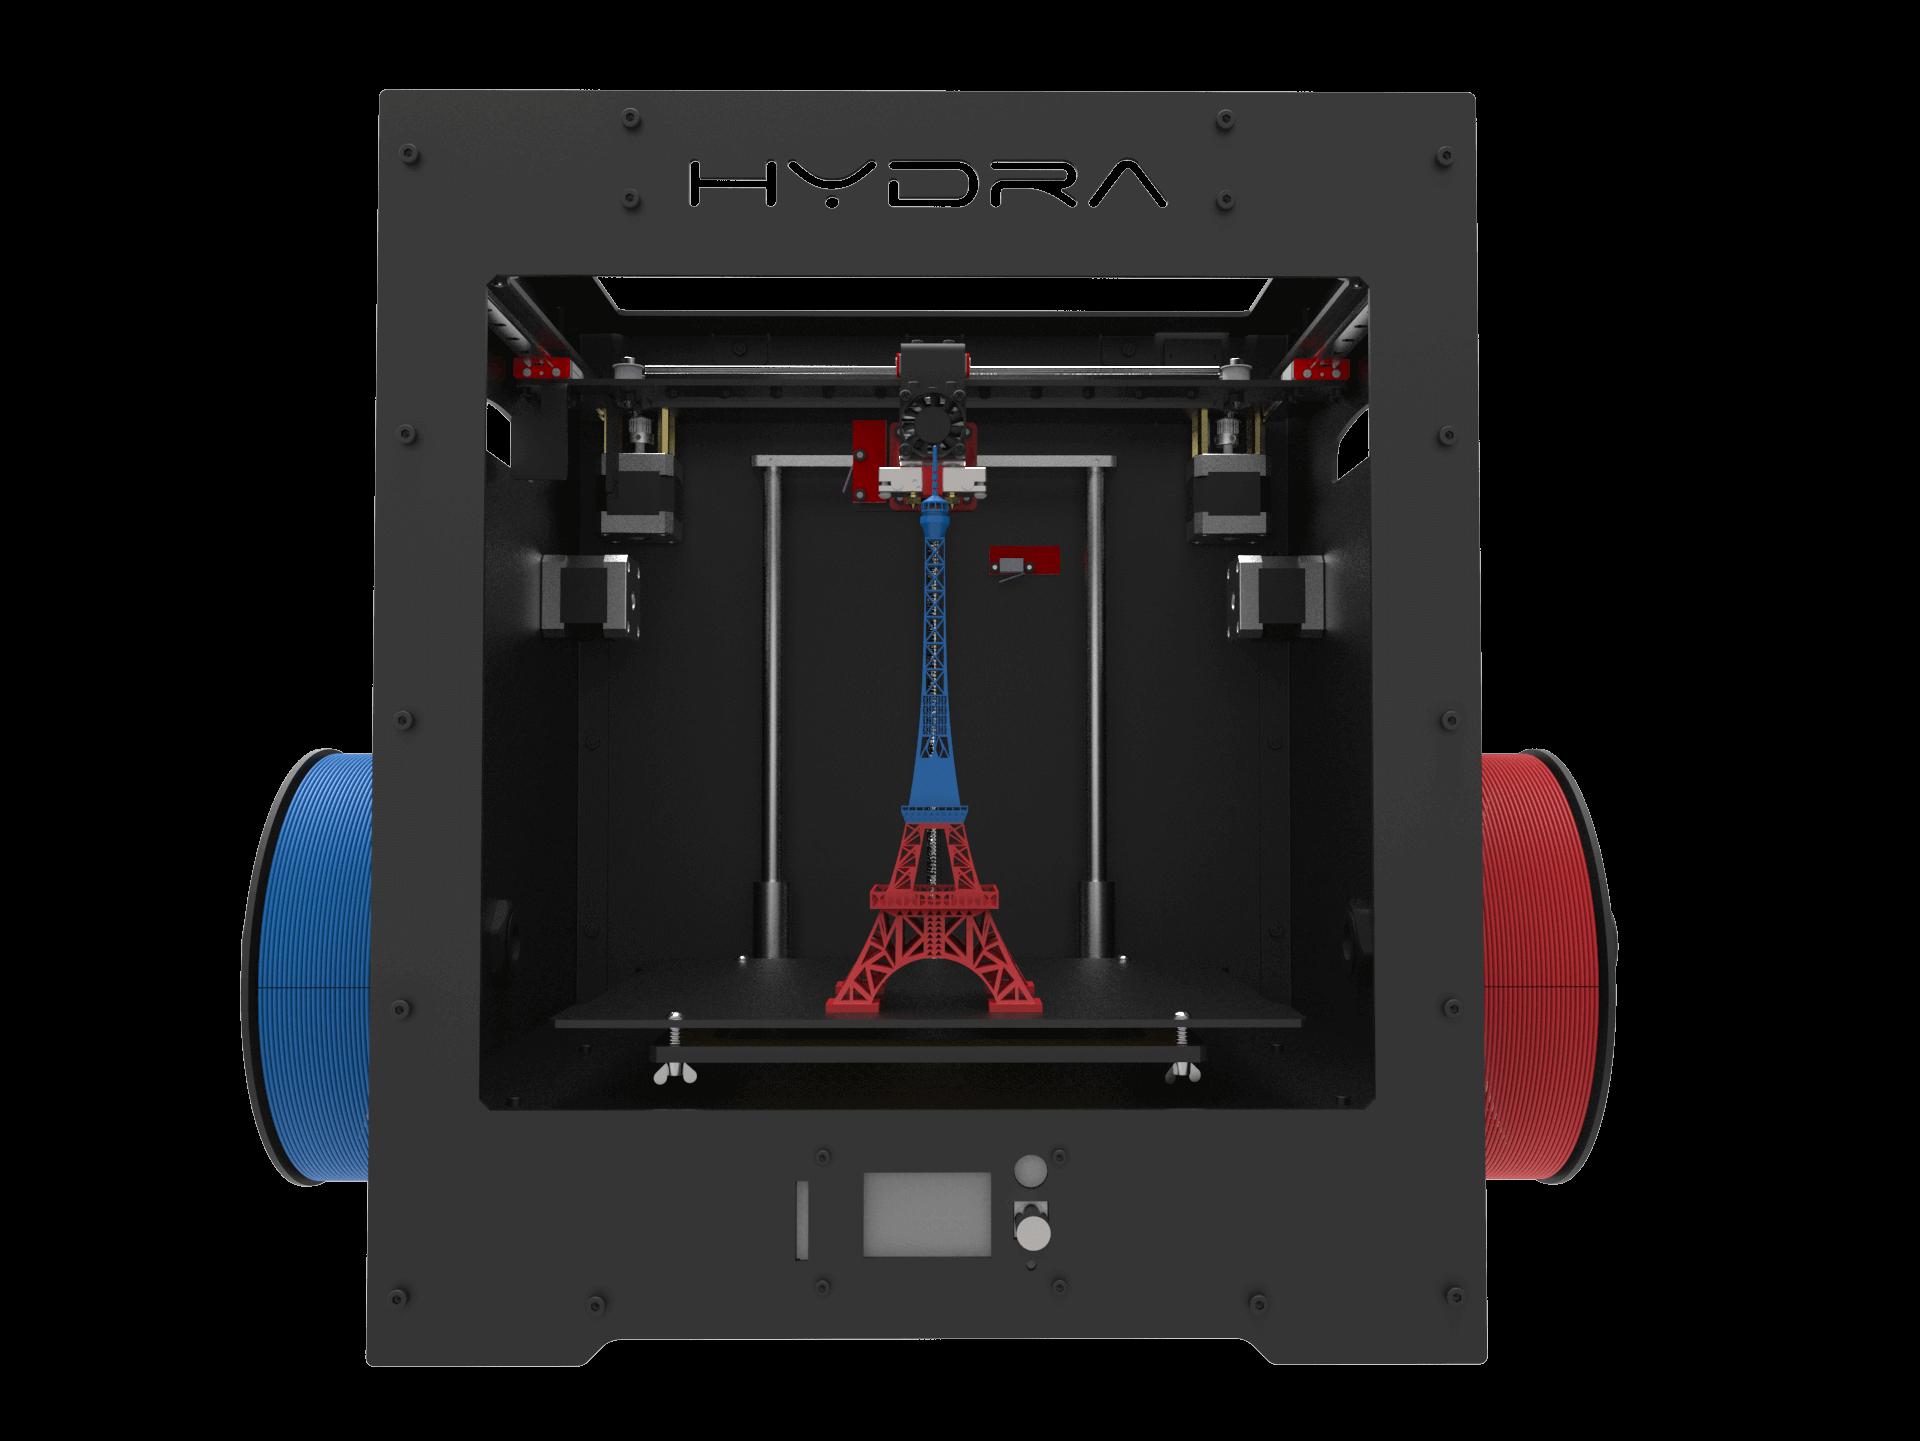 Hydra 250 Dual 3Ding - 3D printers